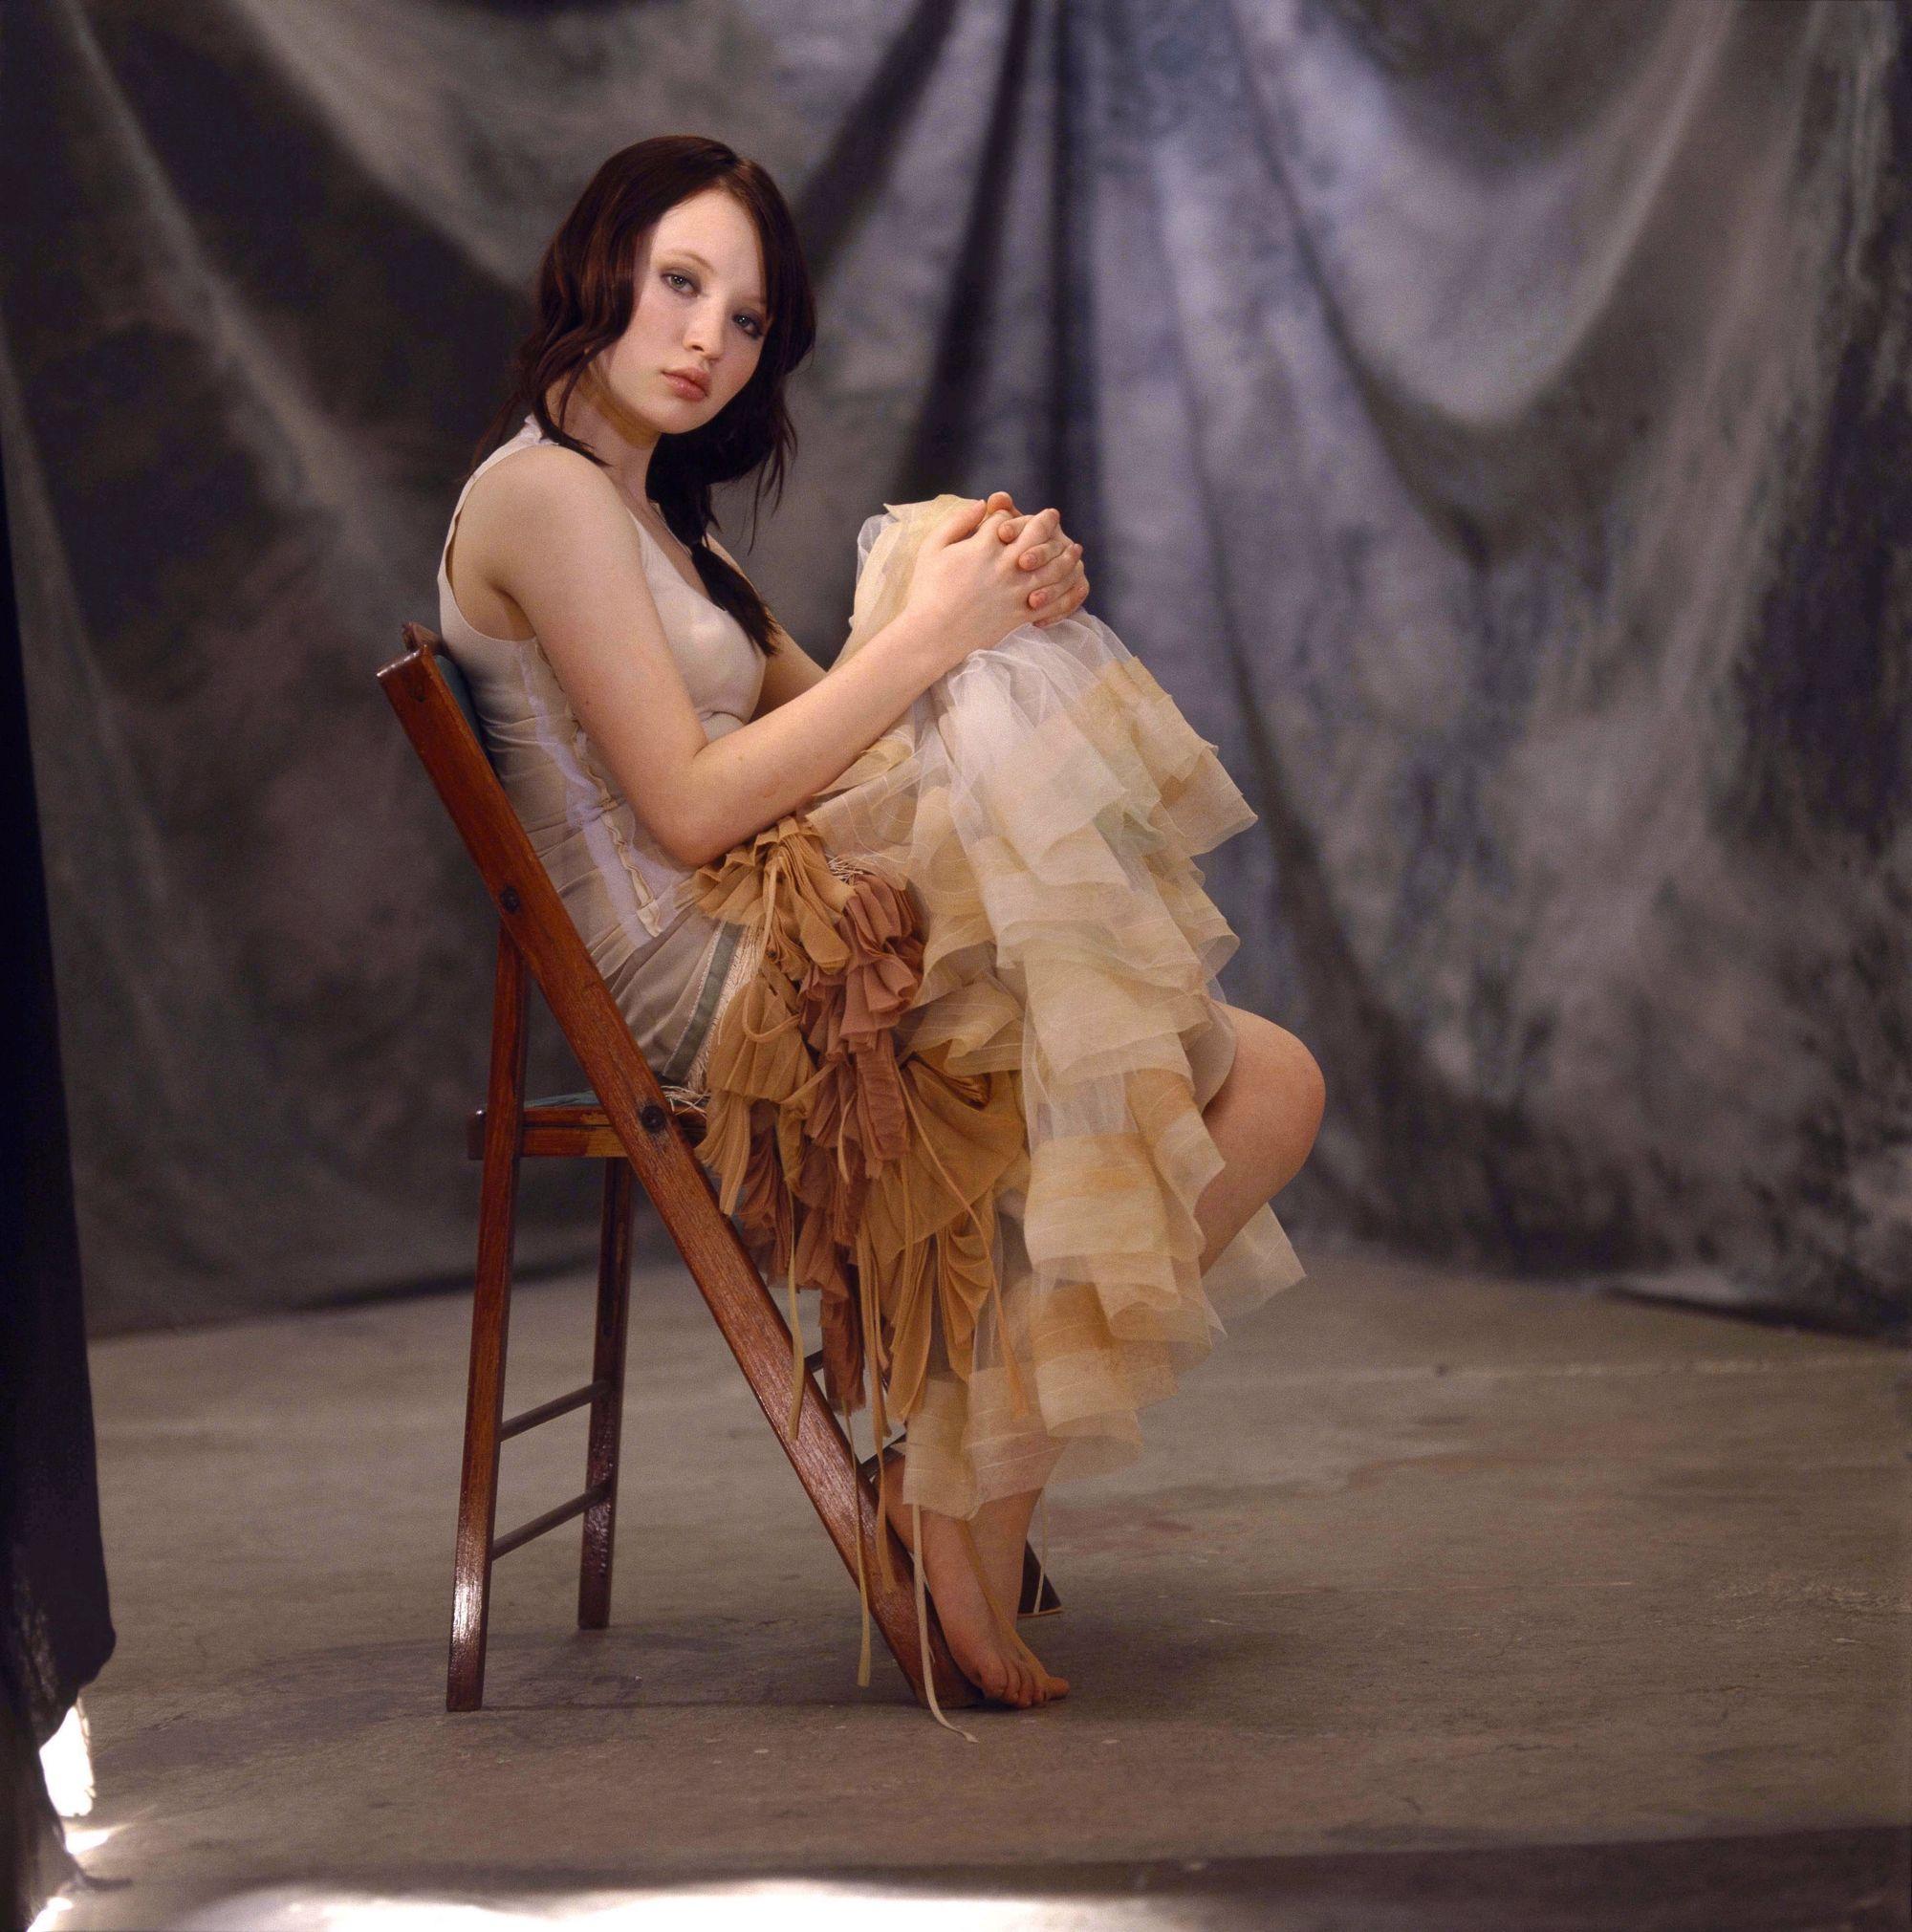 https://pics.wikifeet.com/Emily-Browning-Feet-222377.jpg